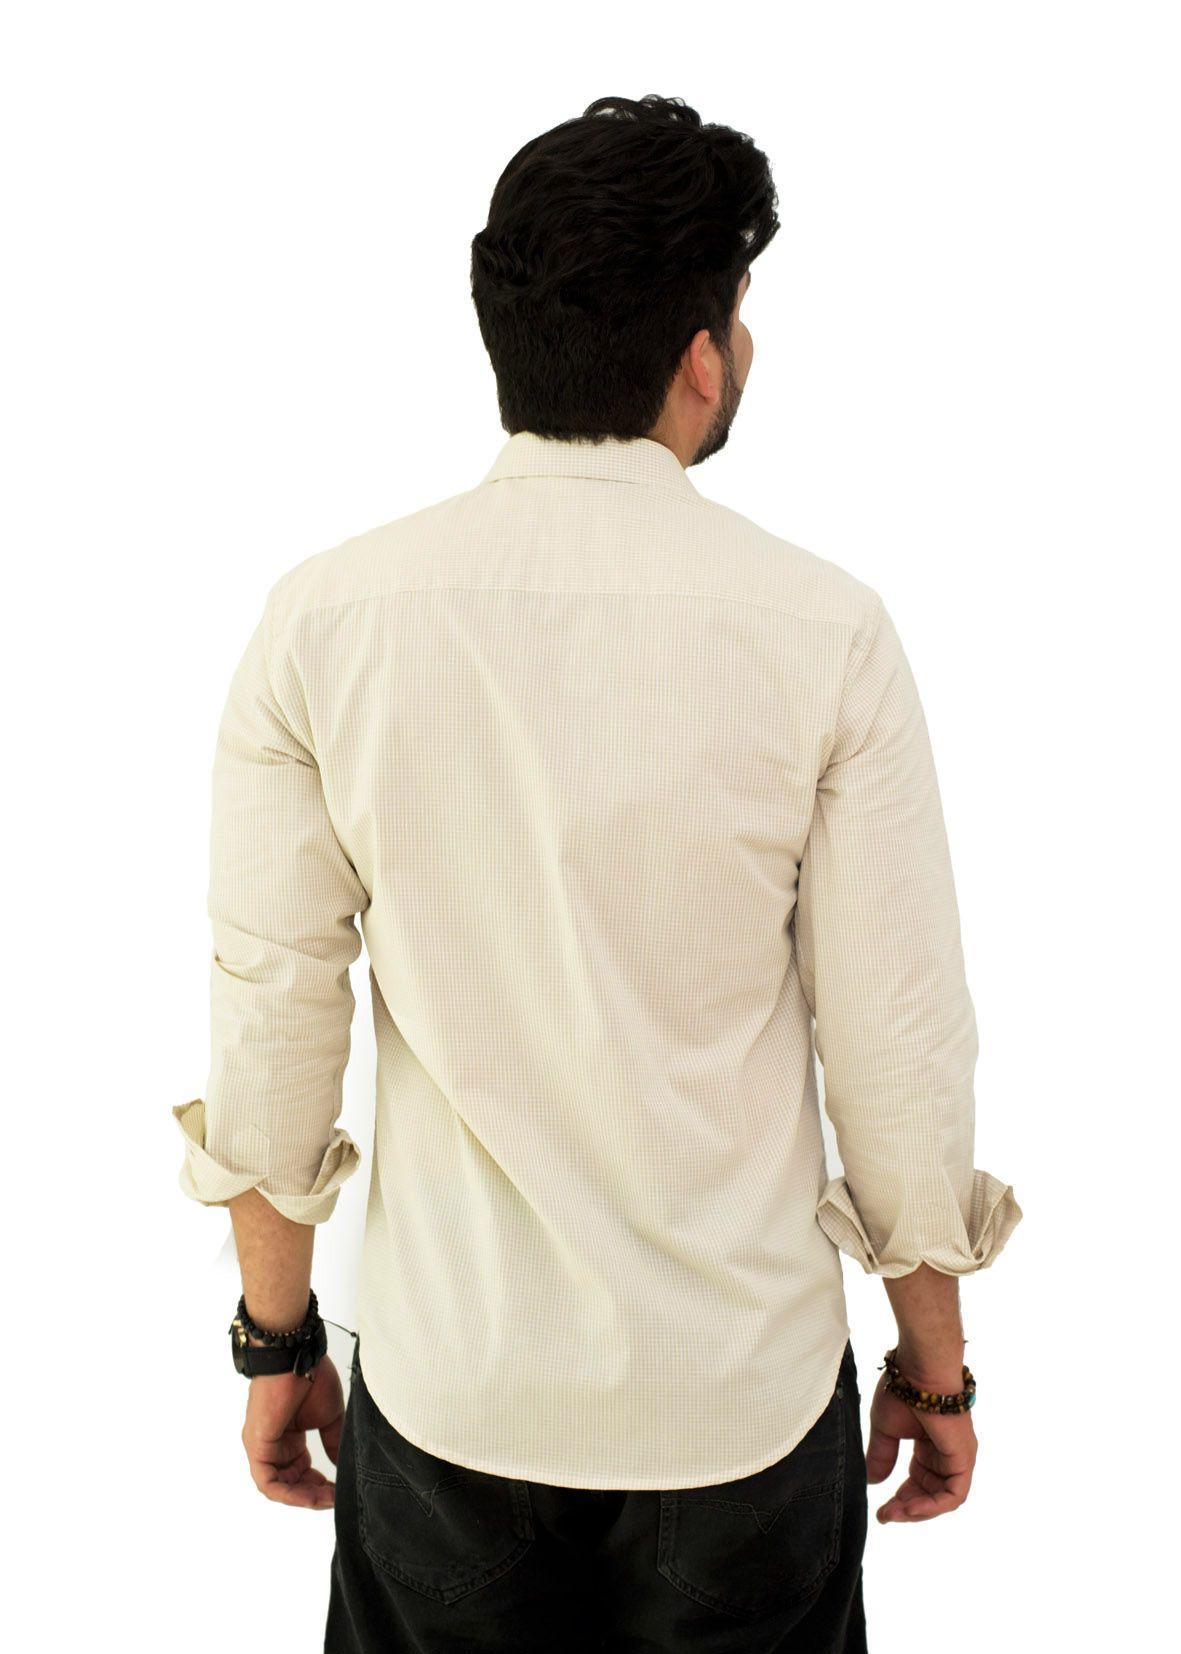 Camisa Social LCT  Xadrez  - Ca Brasileira